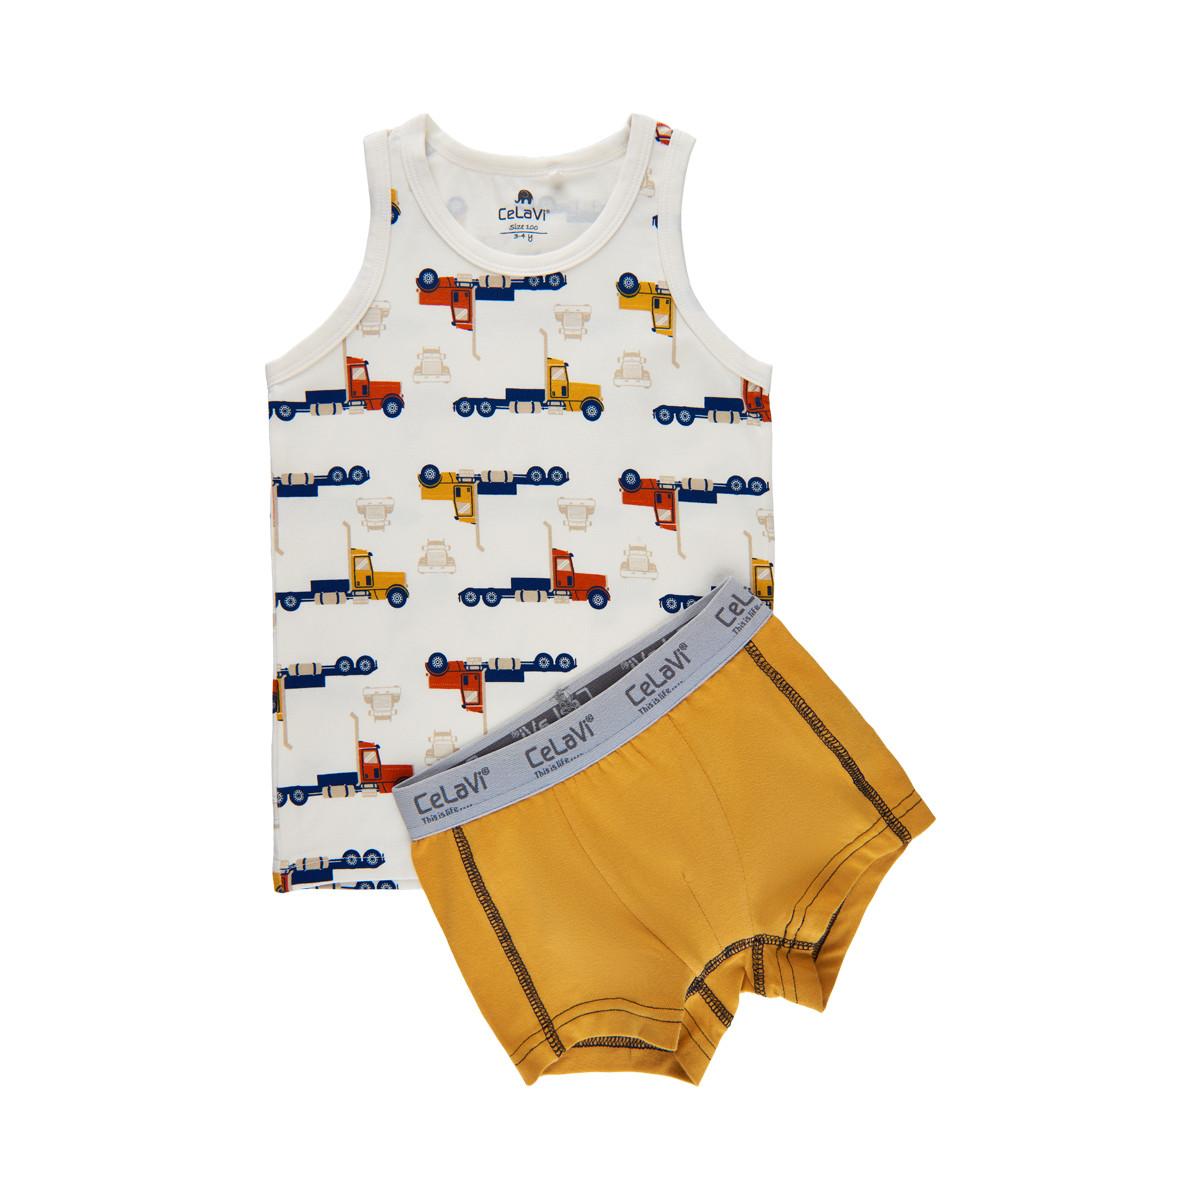 Celavi Baby Leggings with Print Toddler Underwear Set